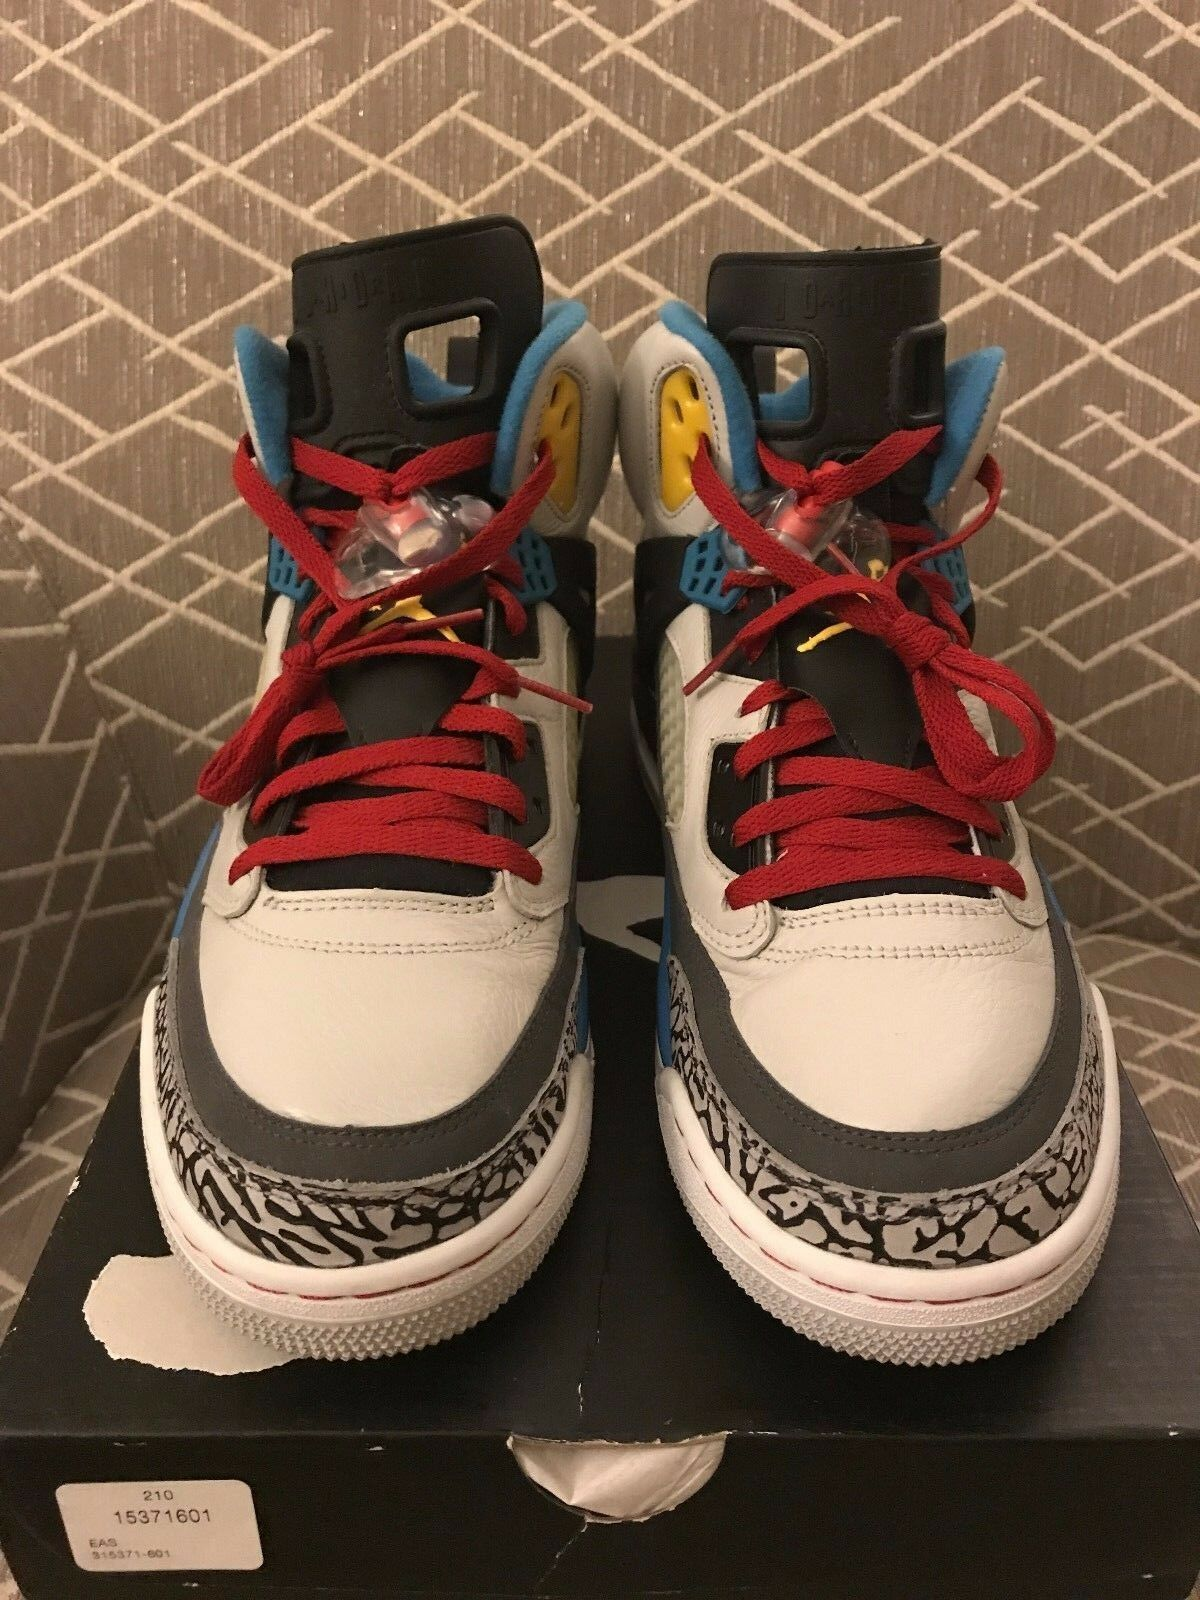 Nike air jordan bordeaux spizike allevati concord space jam yeezy 72-10 nba sz 12